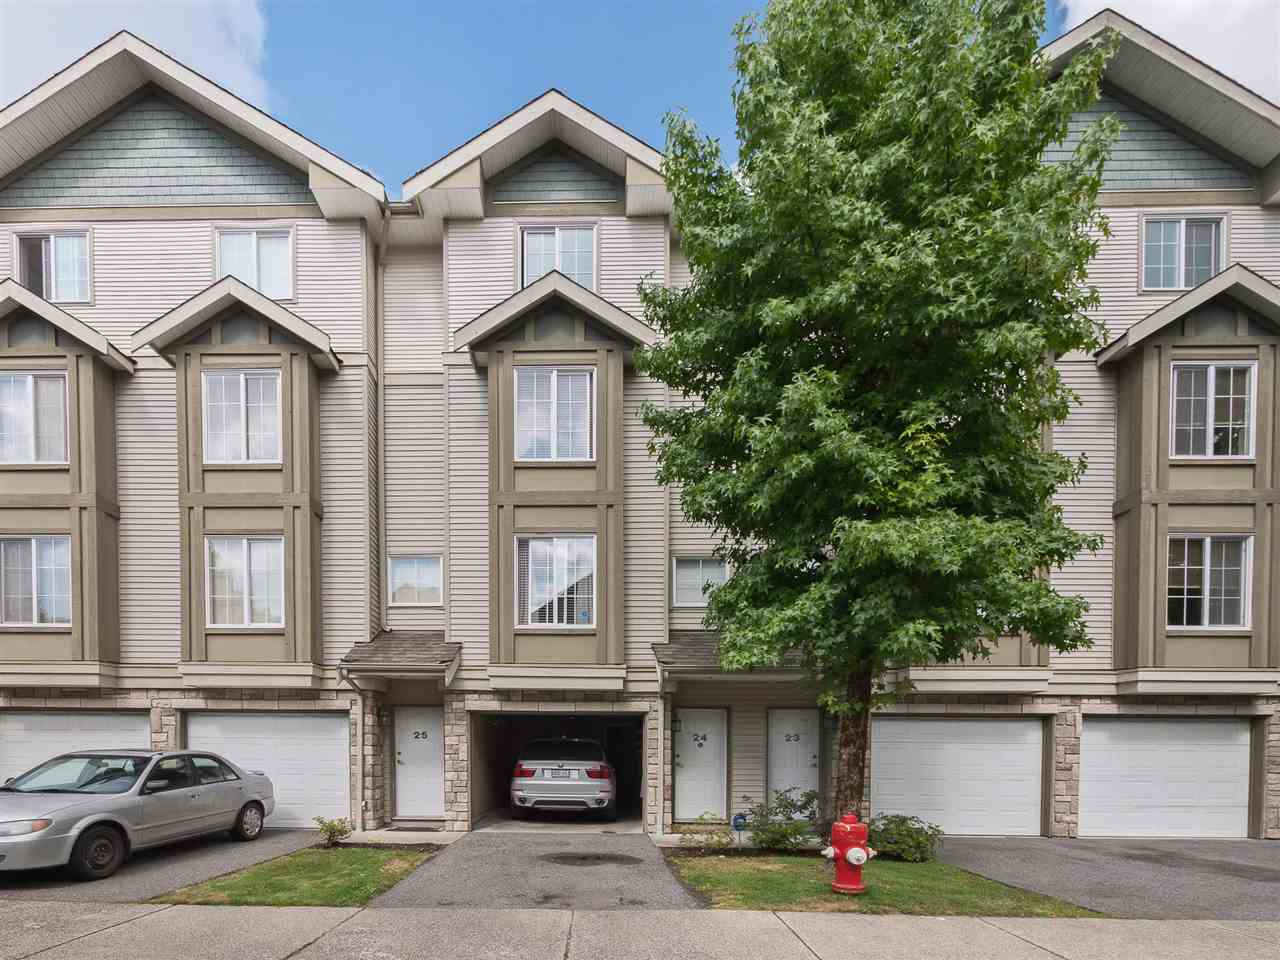 Buliding: 14855 100 Avenue, Surrey, BC